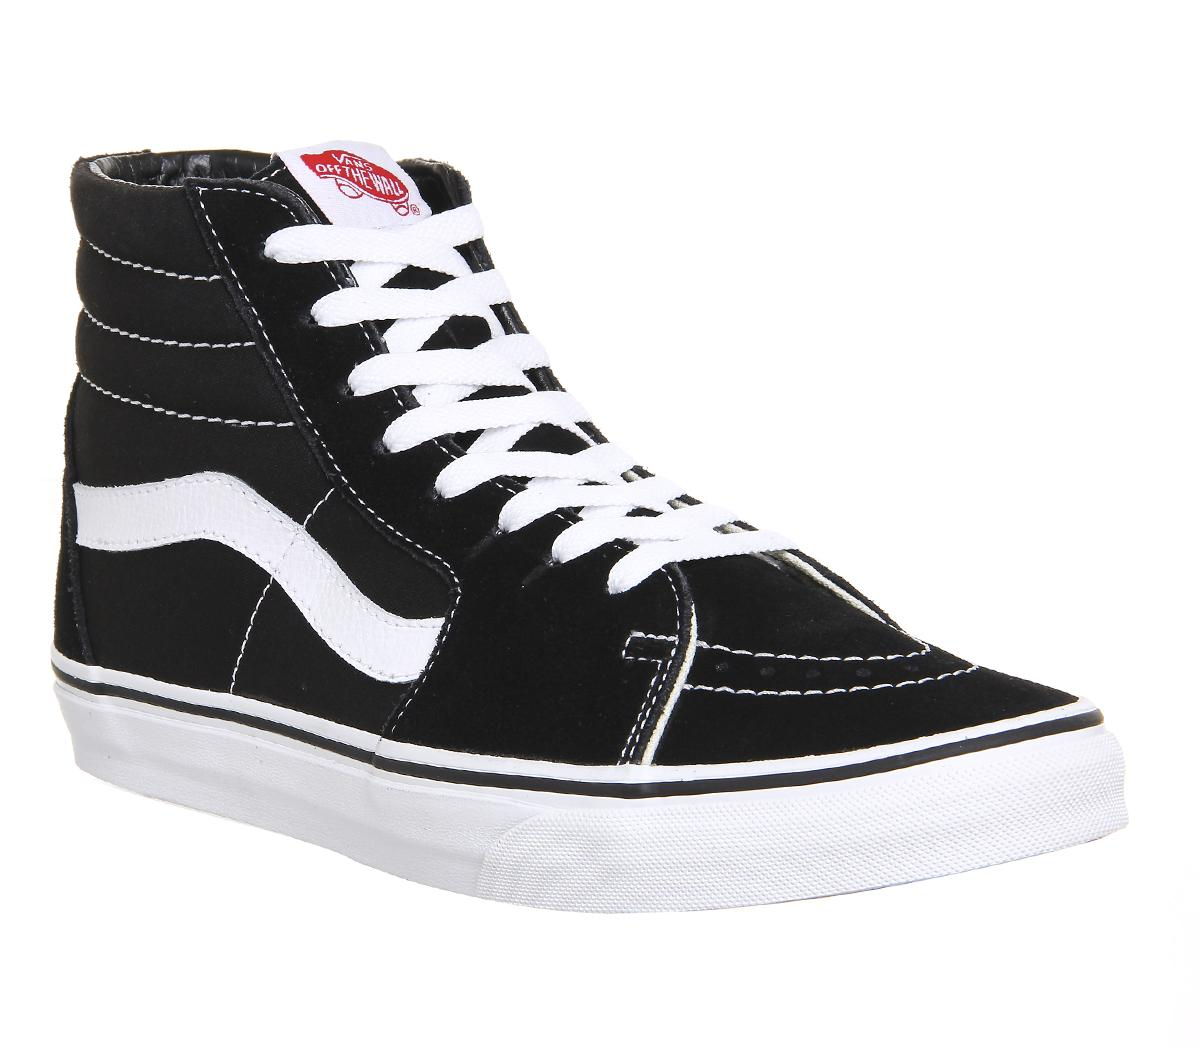 womens black & white vans sk8 hi suede trainers | schuh